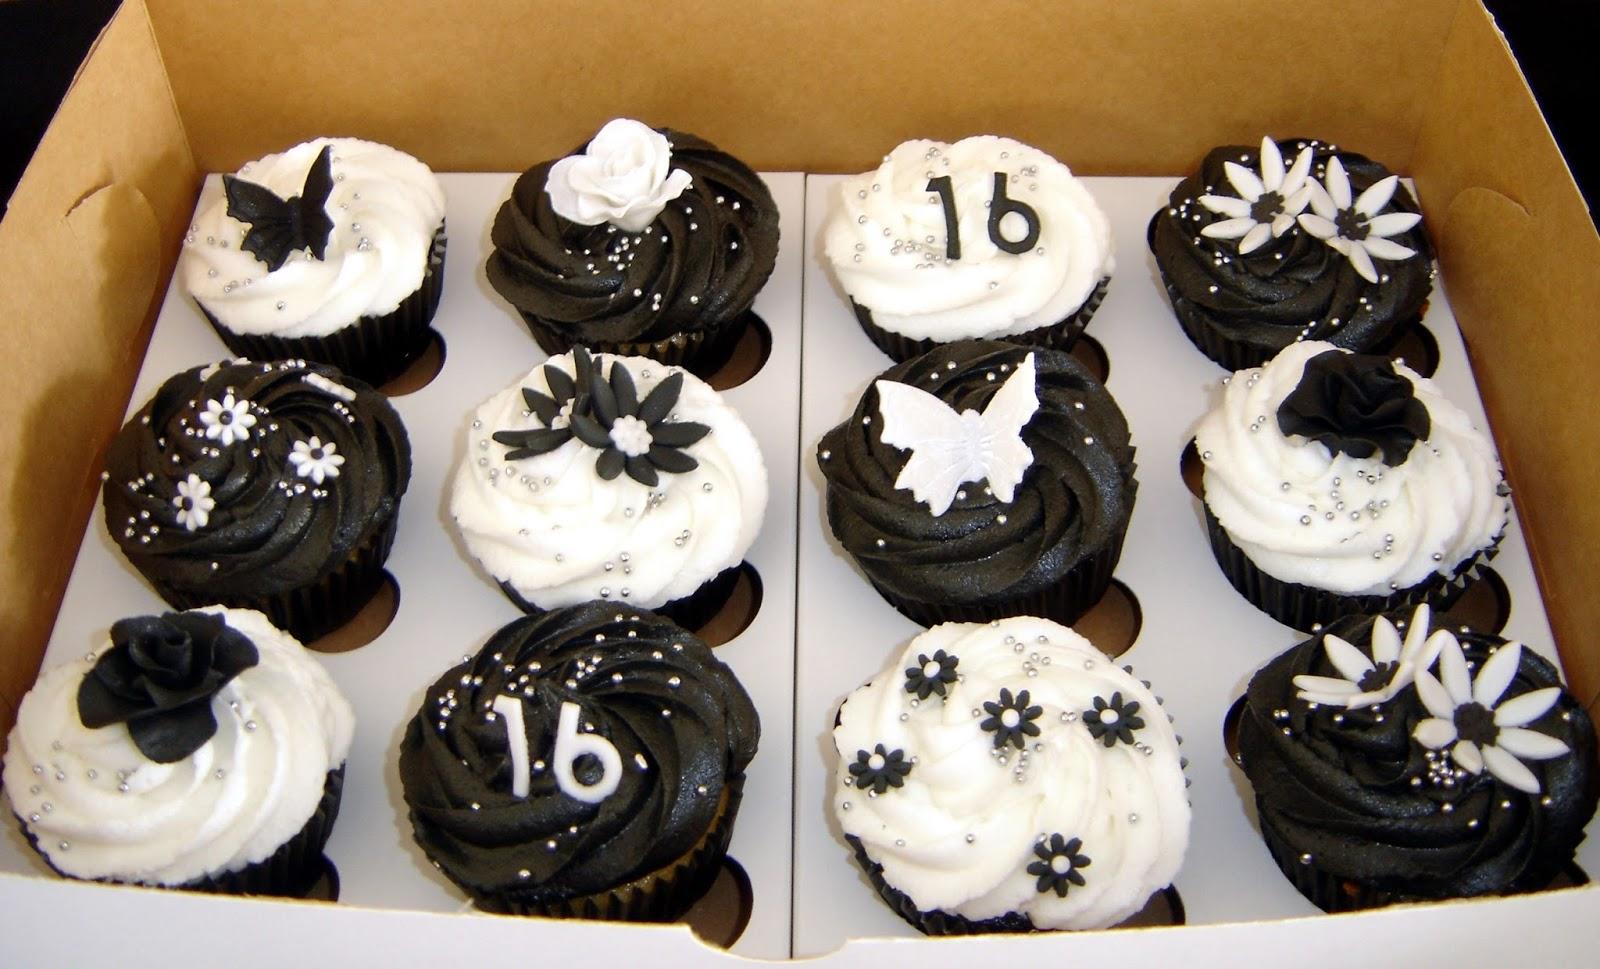 Black And White Cupcake Images : Cake till u drop: Black and white cupcakes